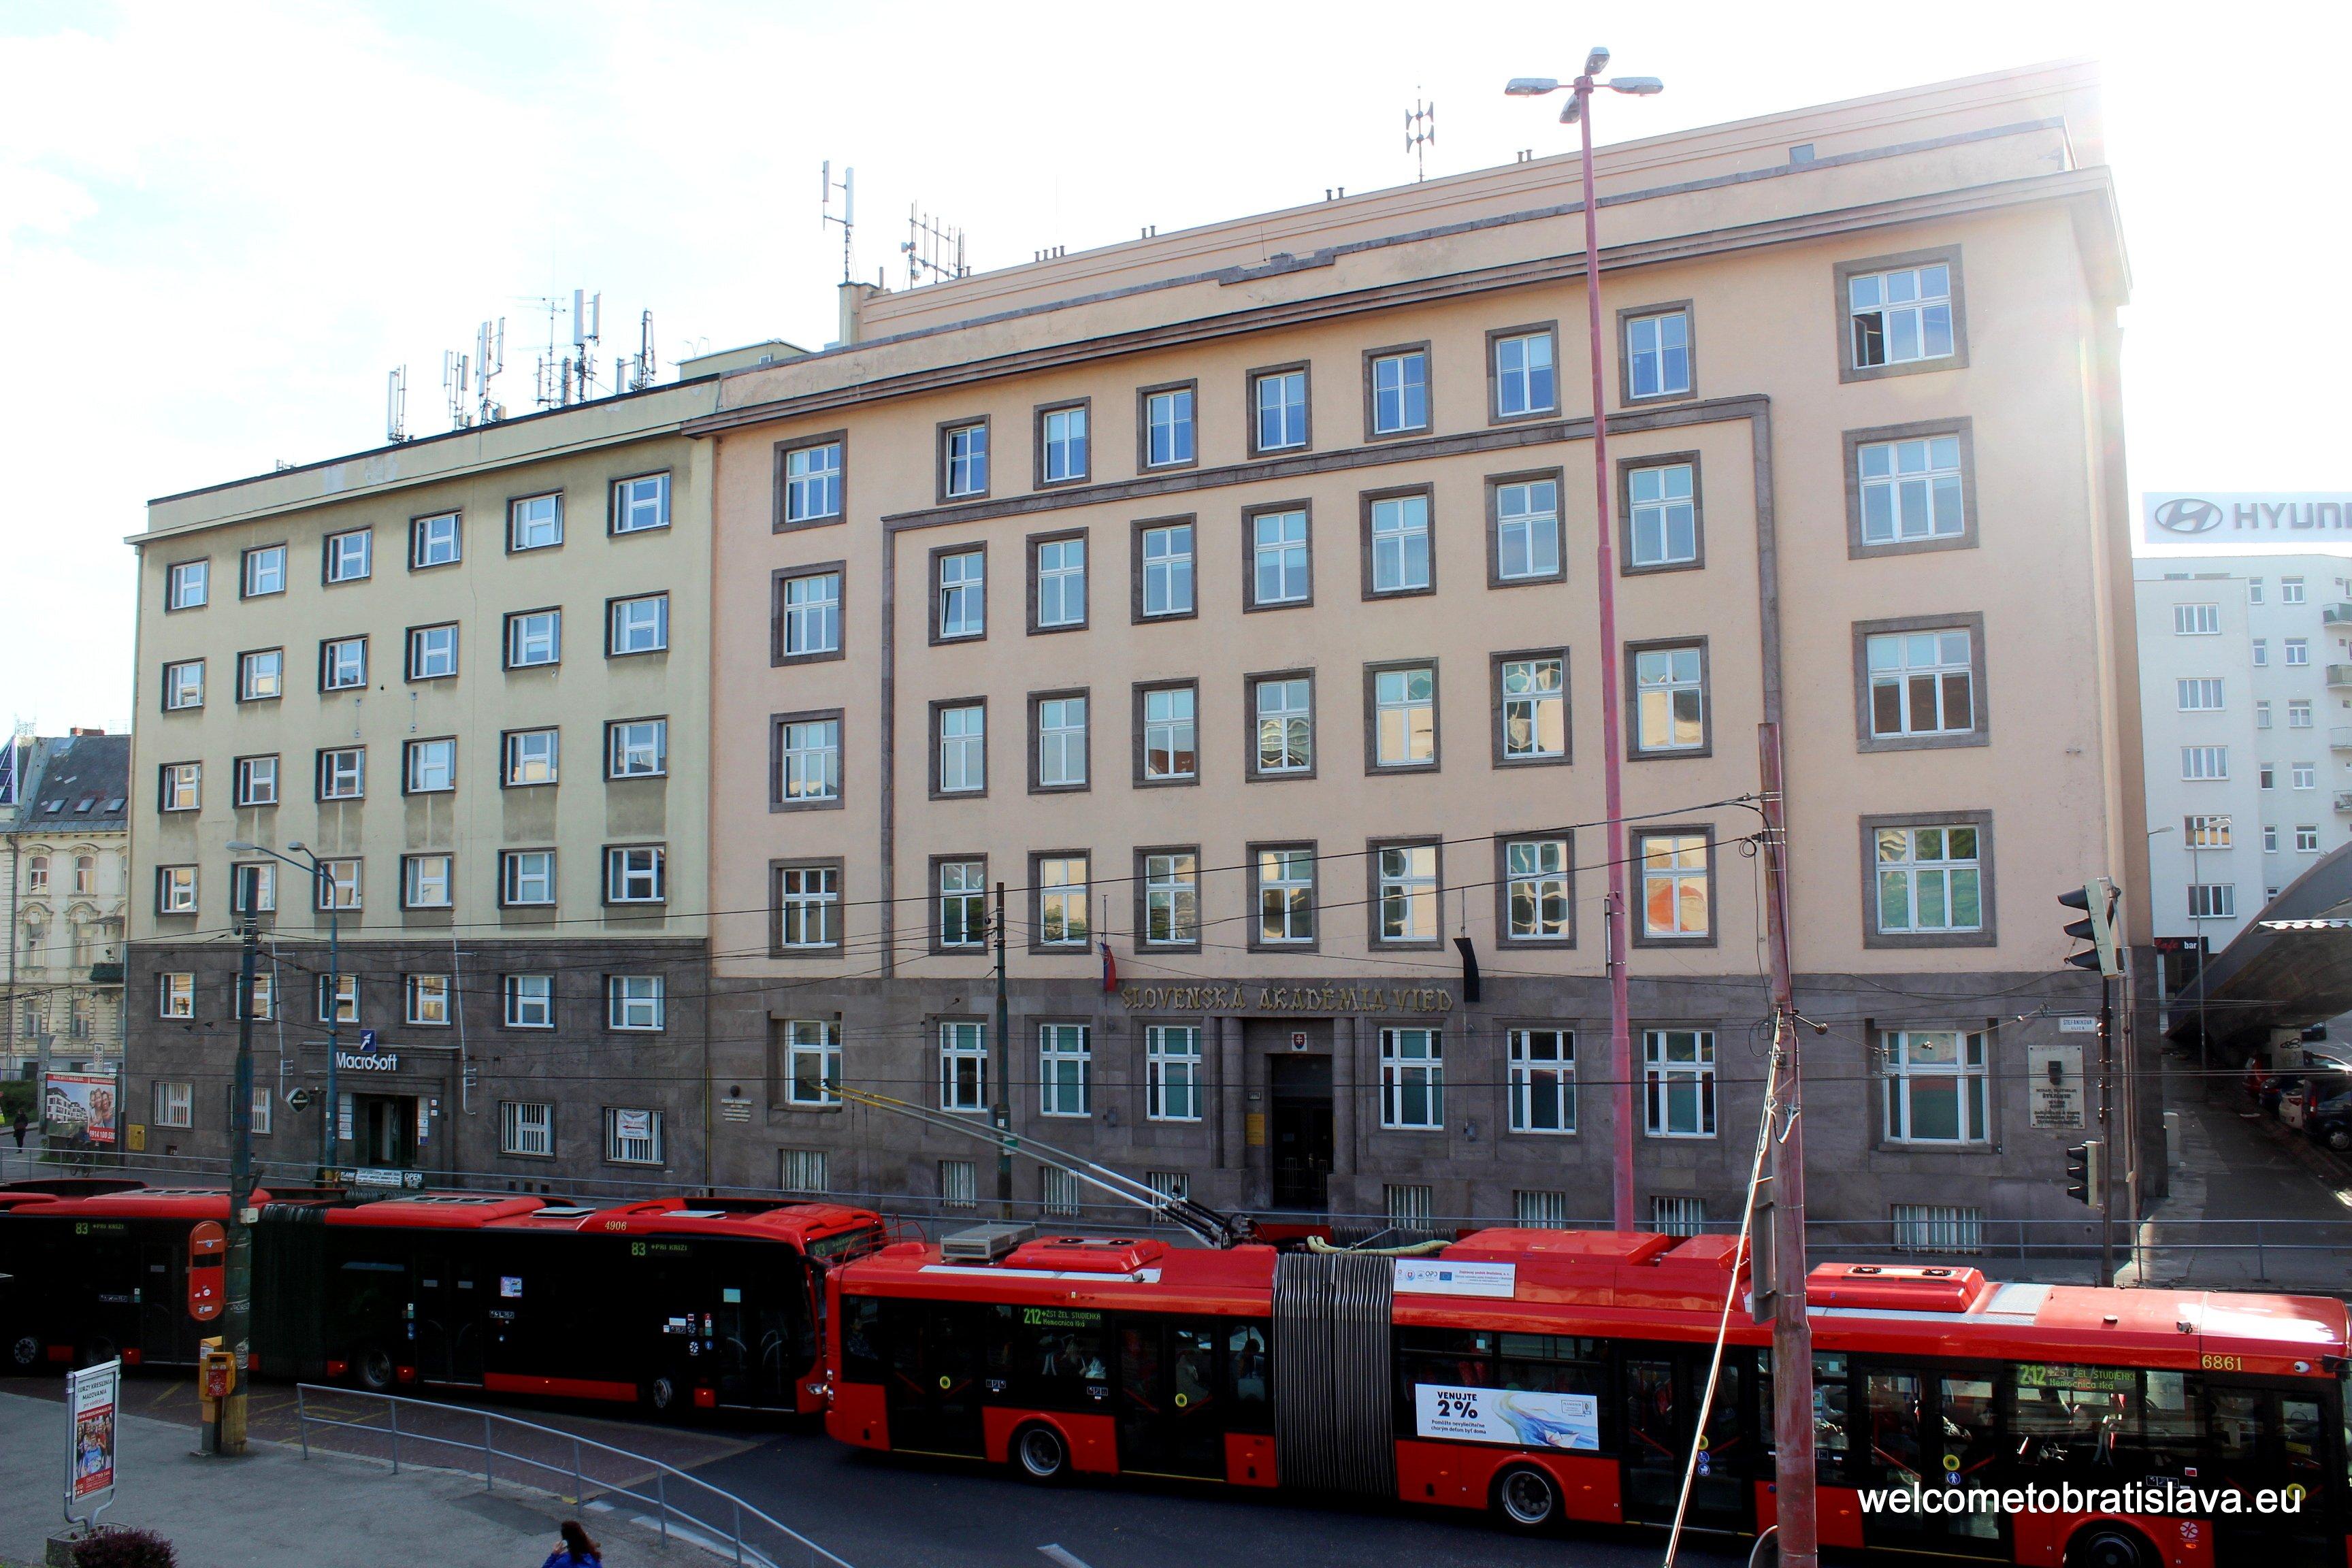 Stefanikova Street - Slovak Academy of Sciences